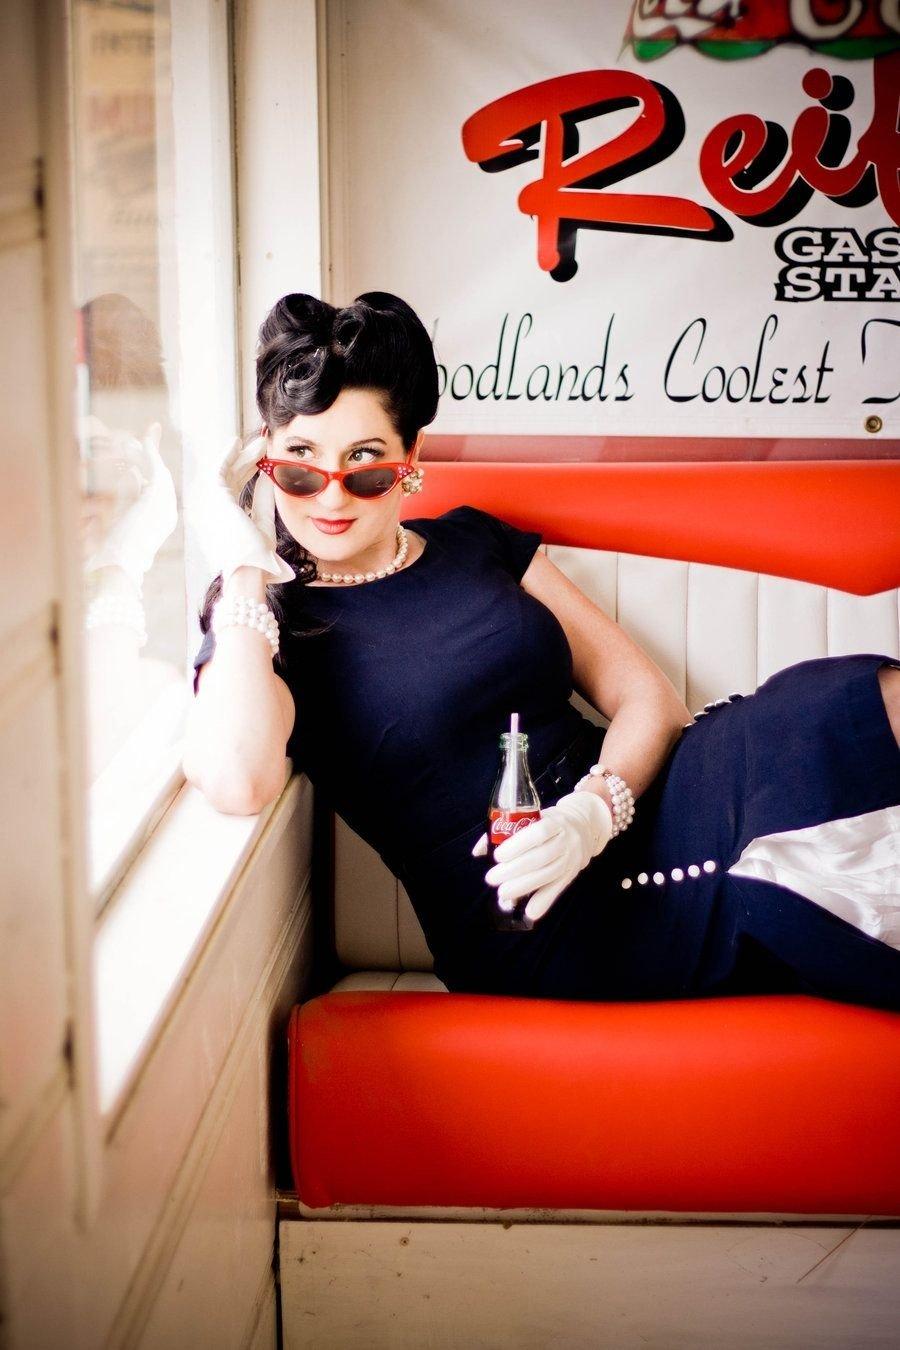 10 Beautiful Pin Up Girl Photoshoot Ideas pinrobin on pinup photos pinterest photoshoot vintage and 2020